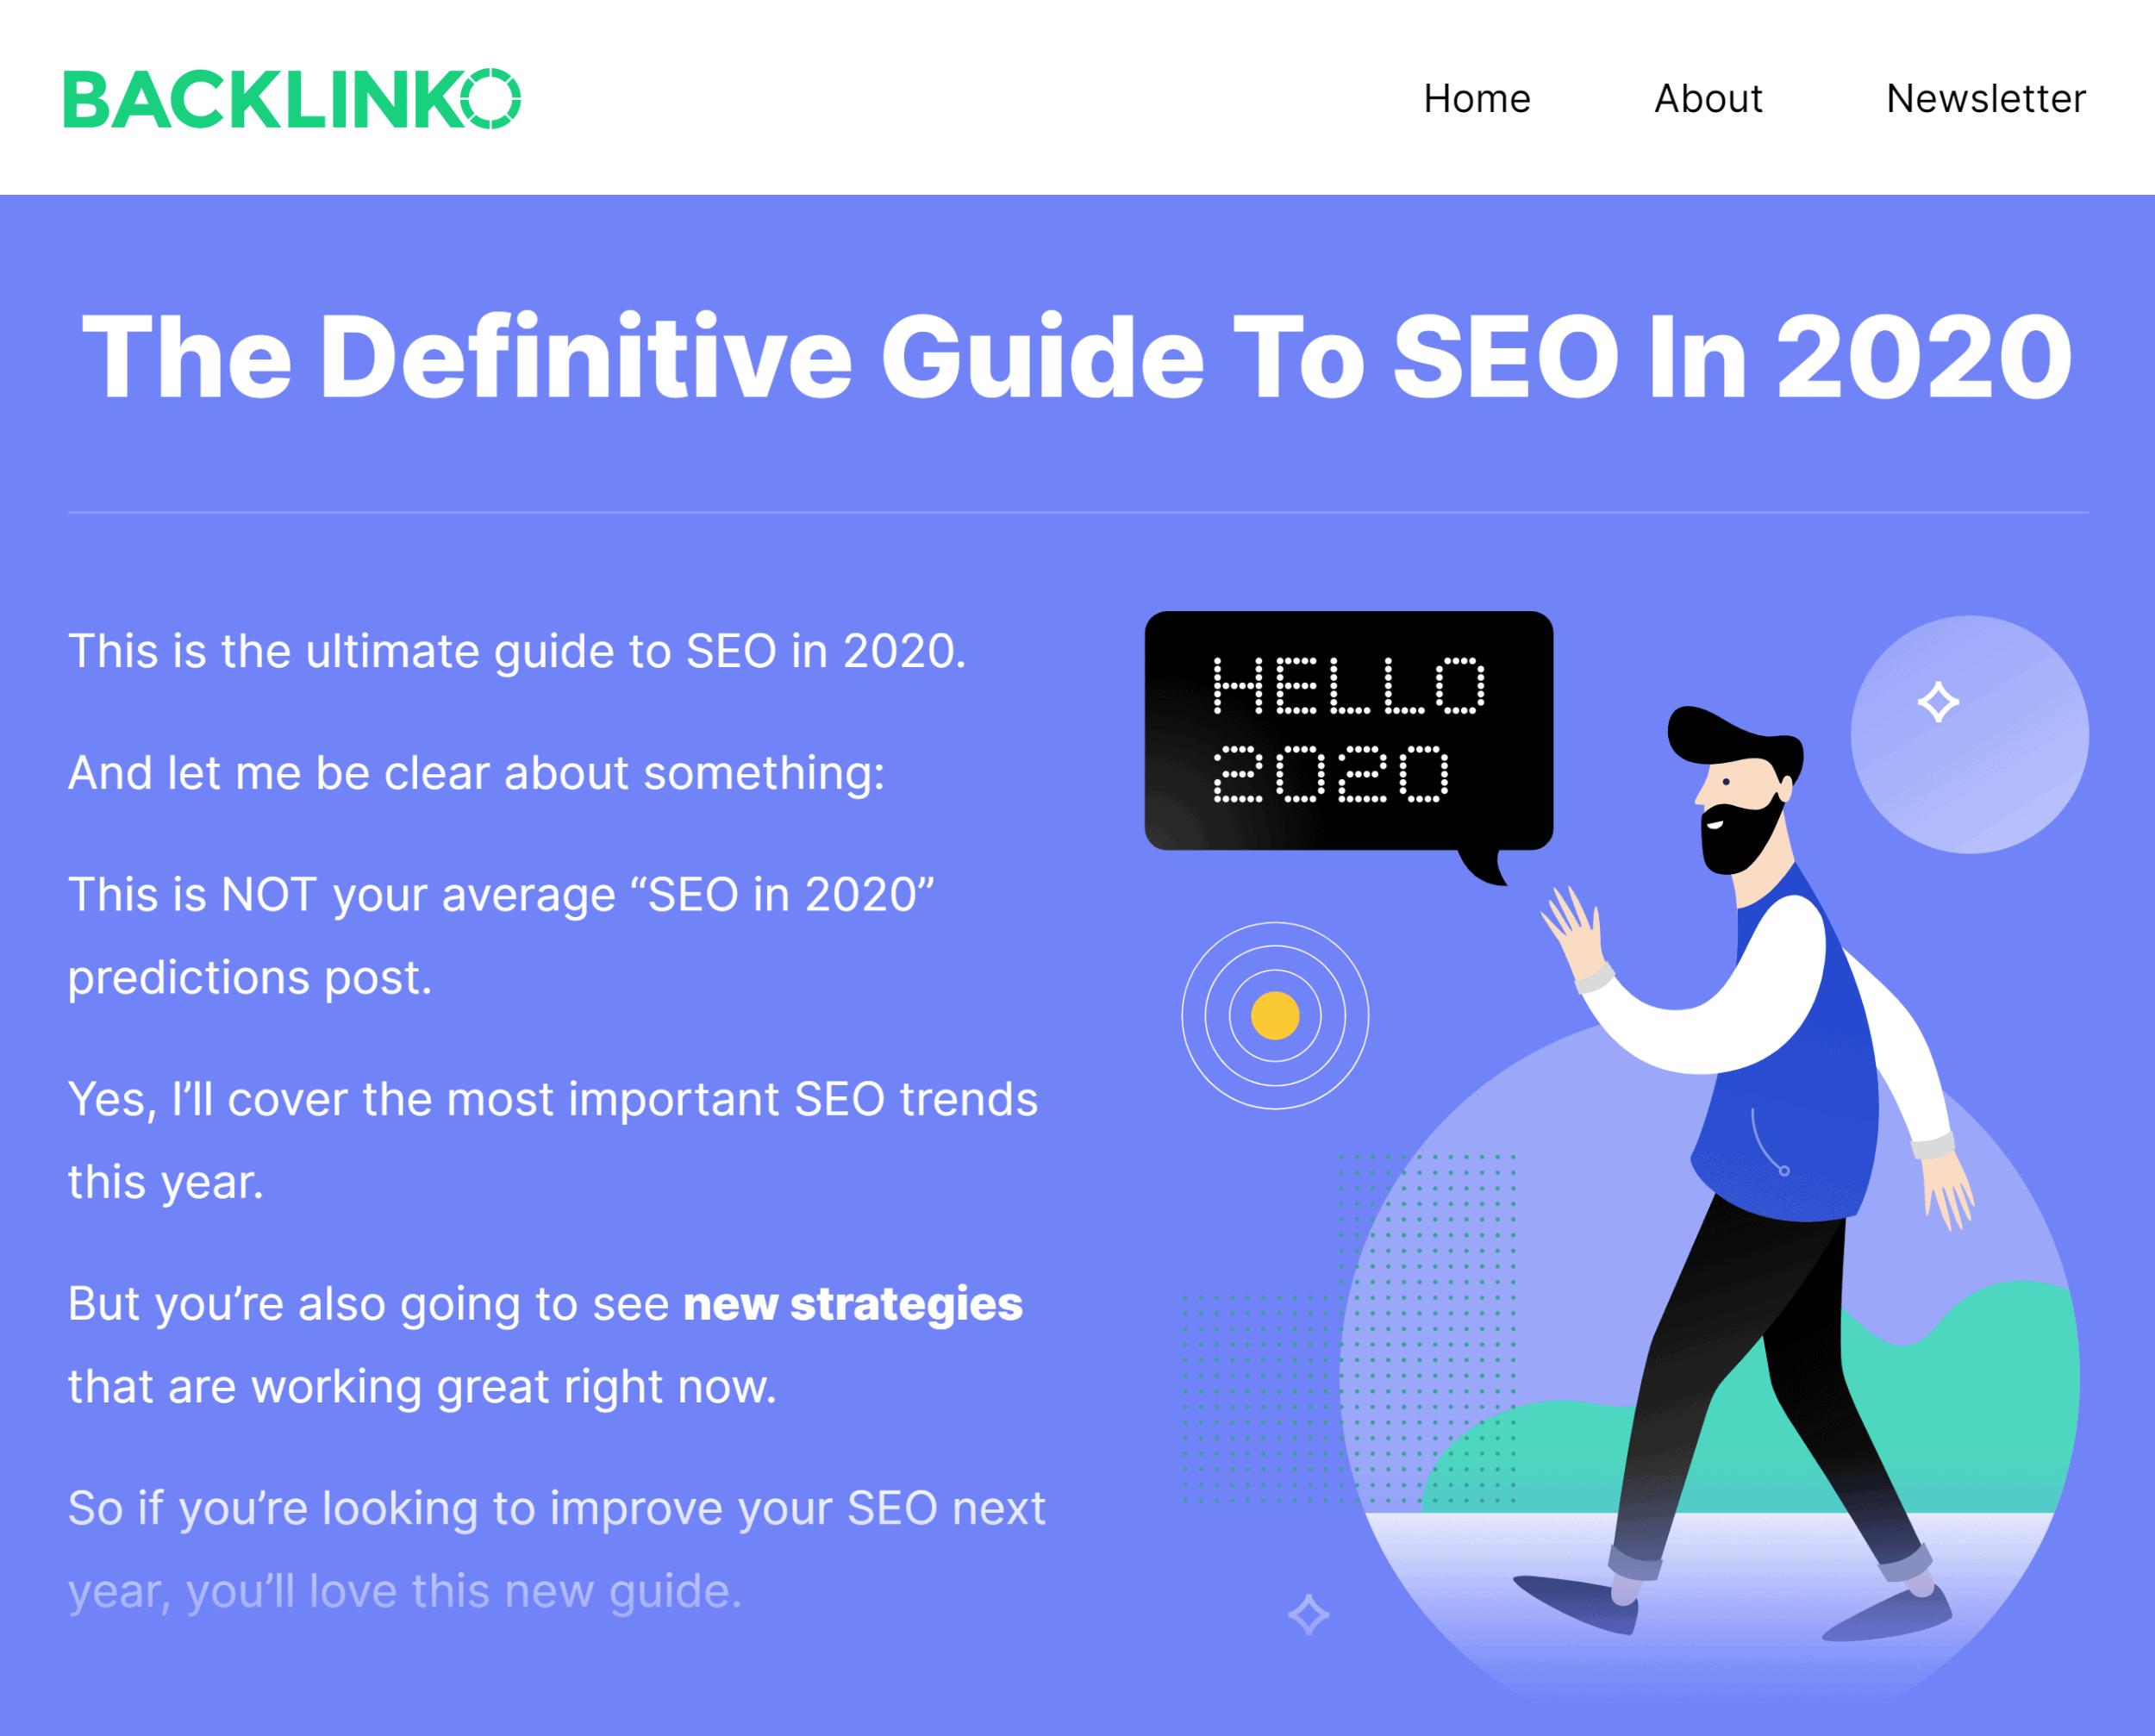 Backlinko – SEO This Year post